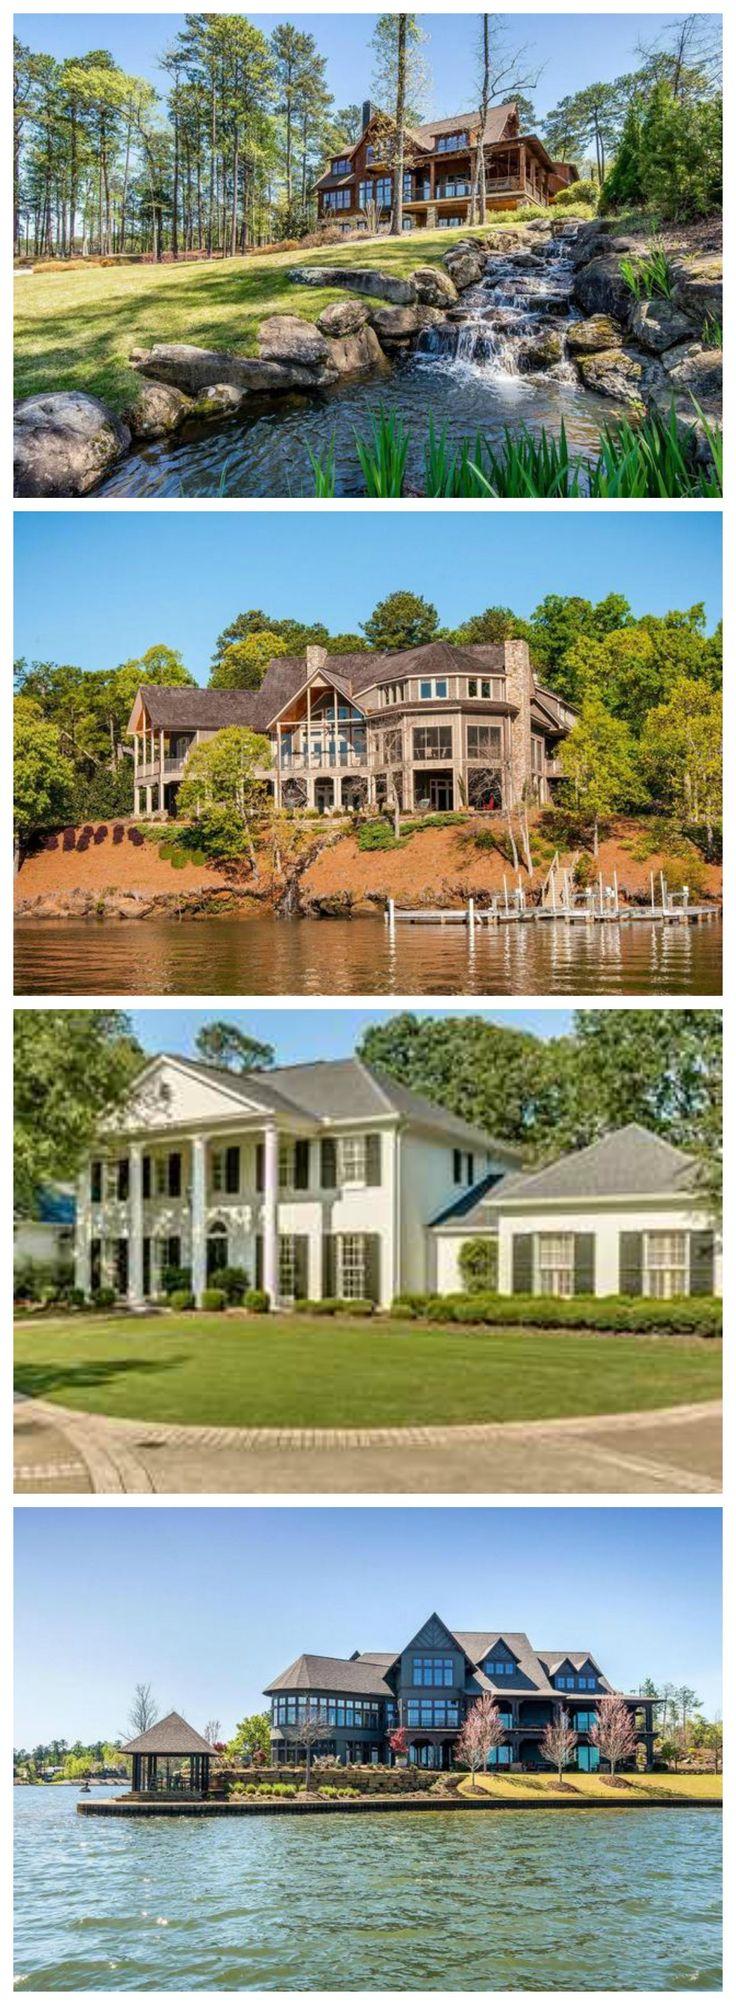 Best Home Decor Design Images On Pinterest Alabama - Alabama most expensive house